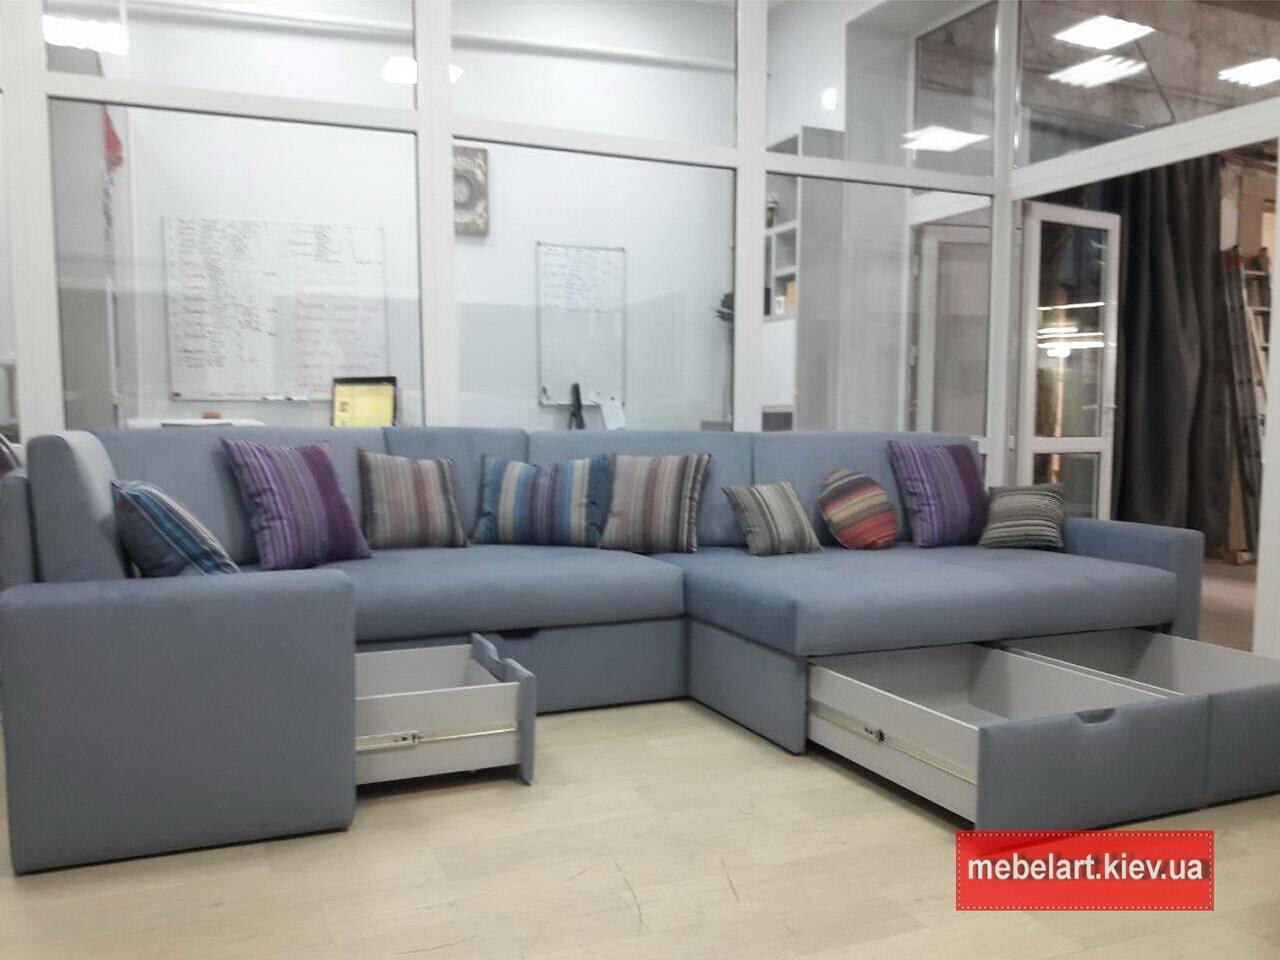 проект двухуглового дивана